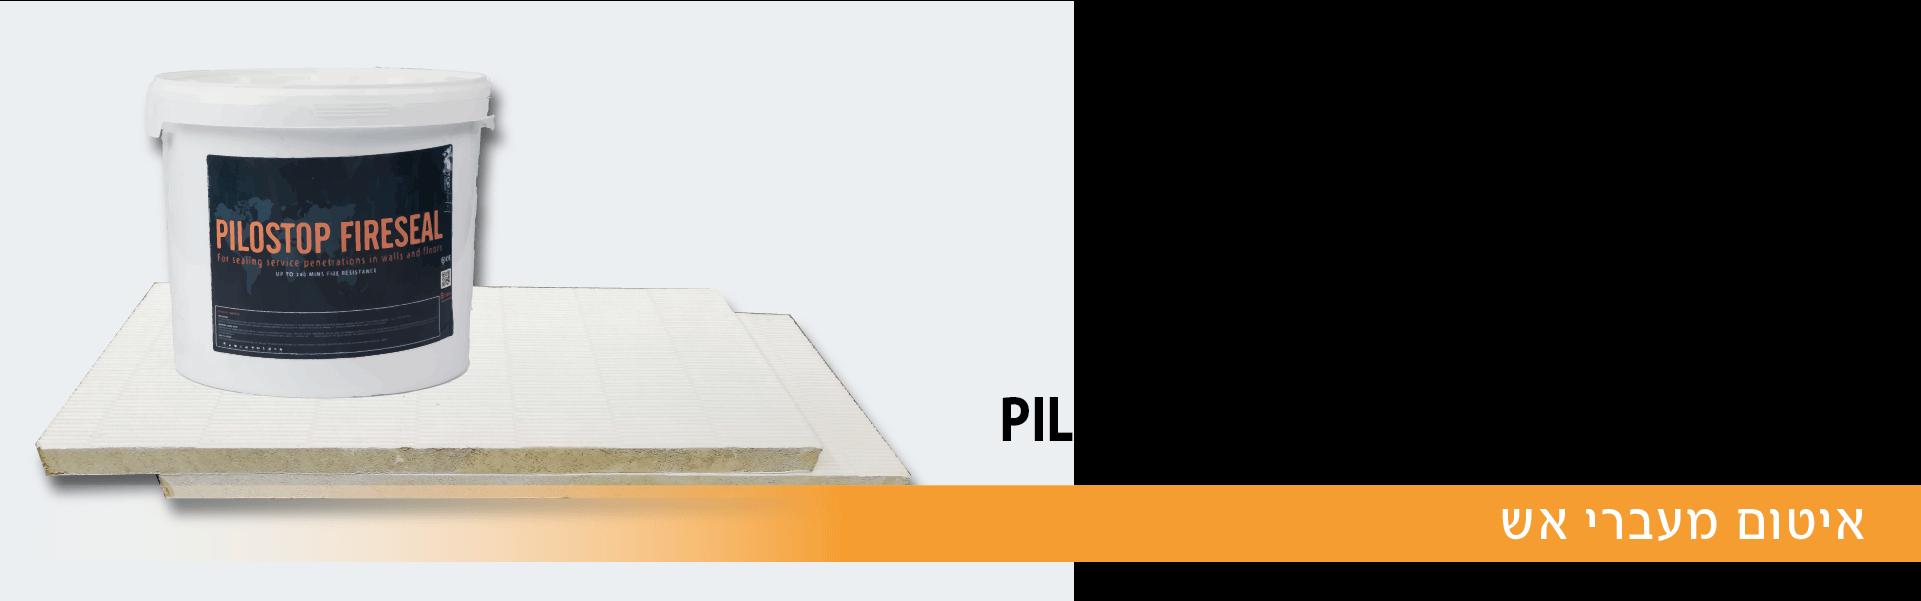 pilostop panel fireseal